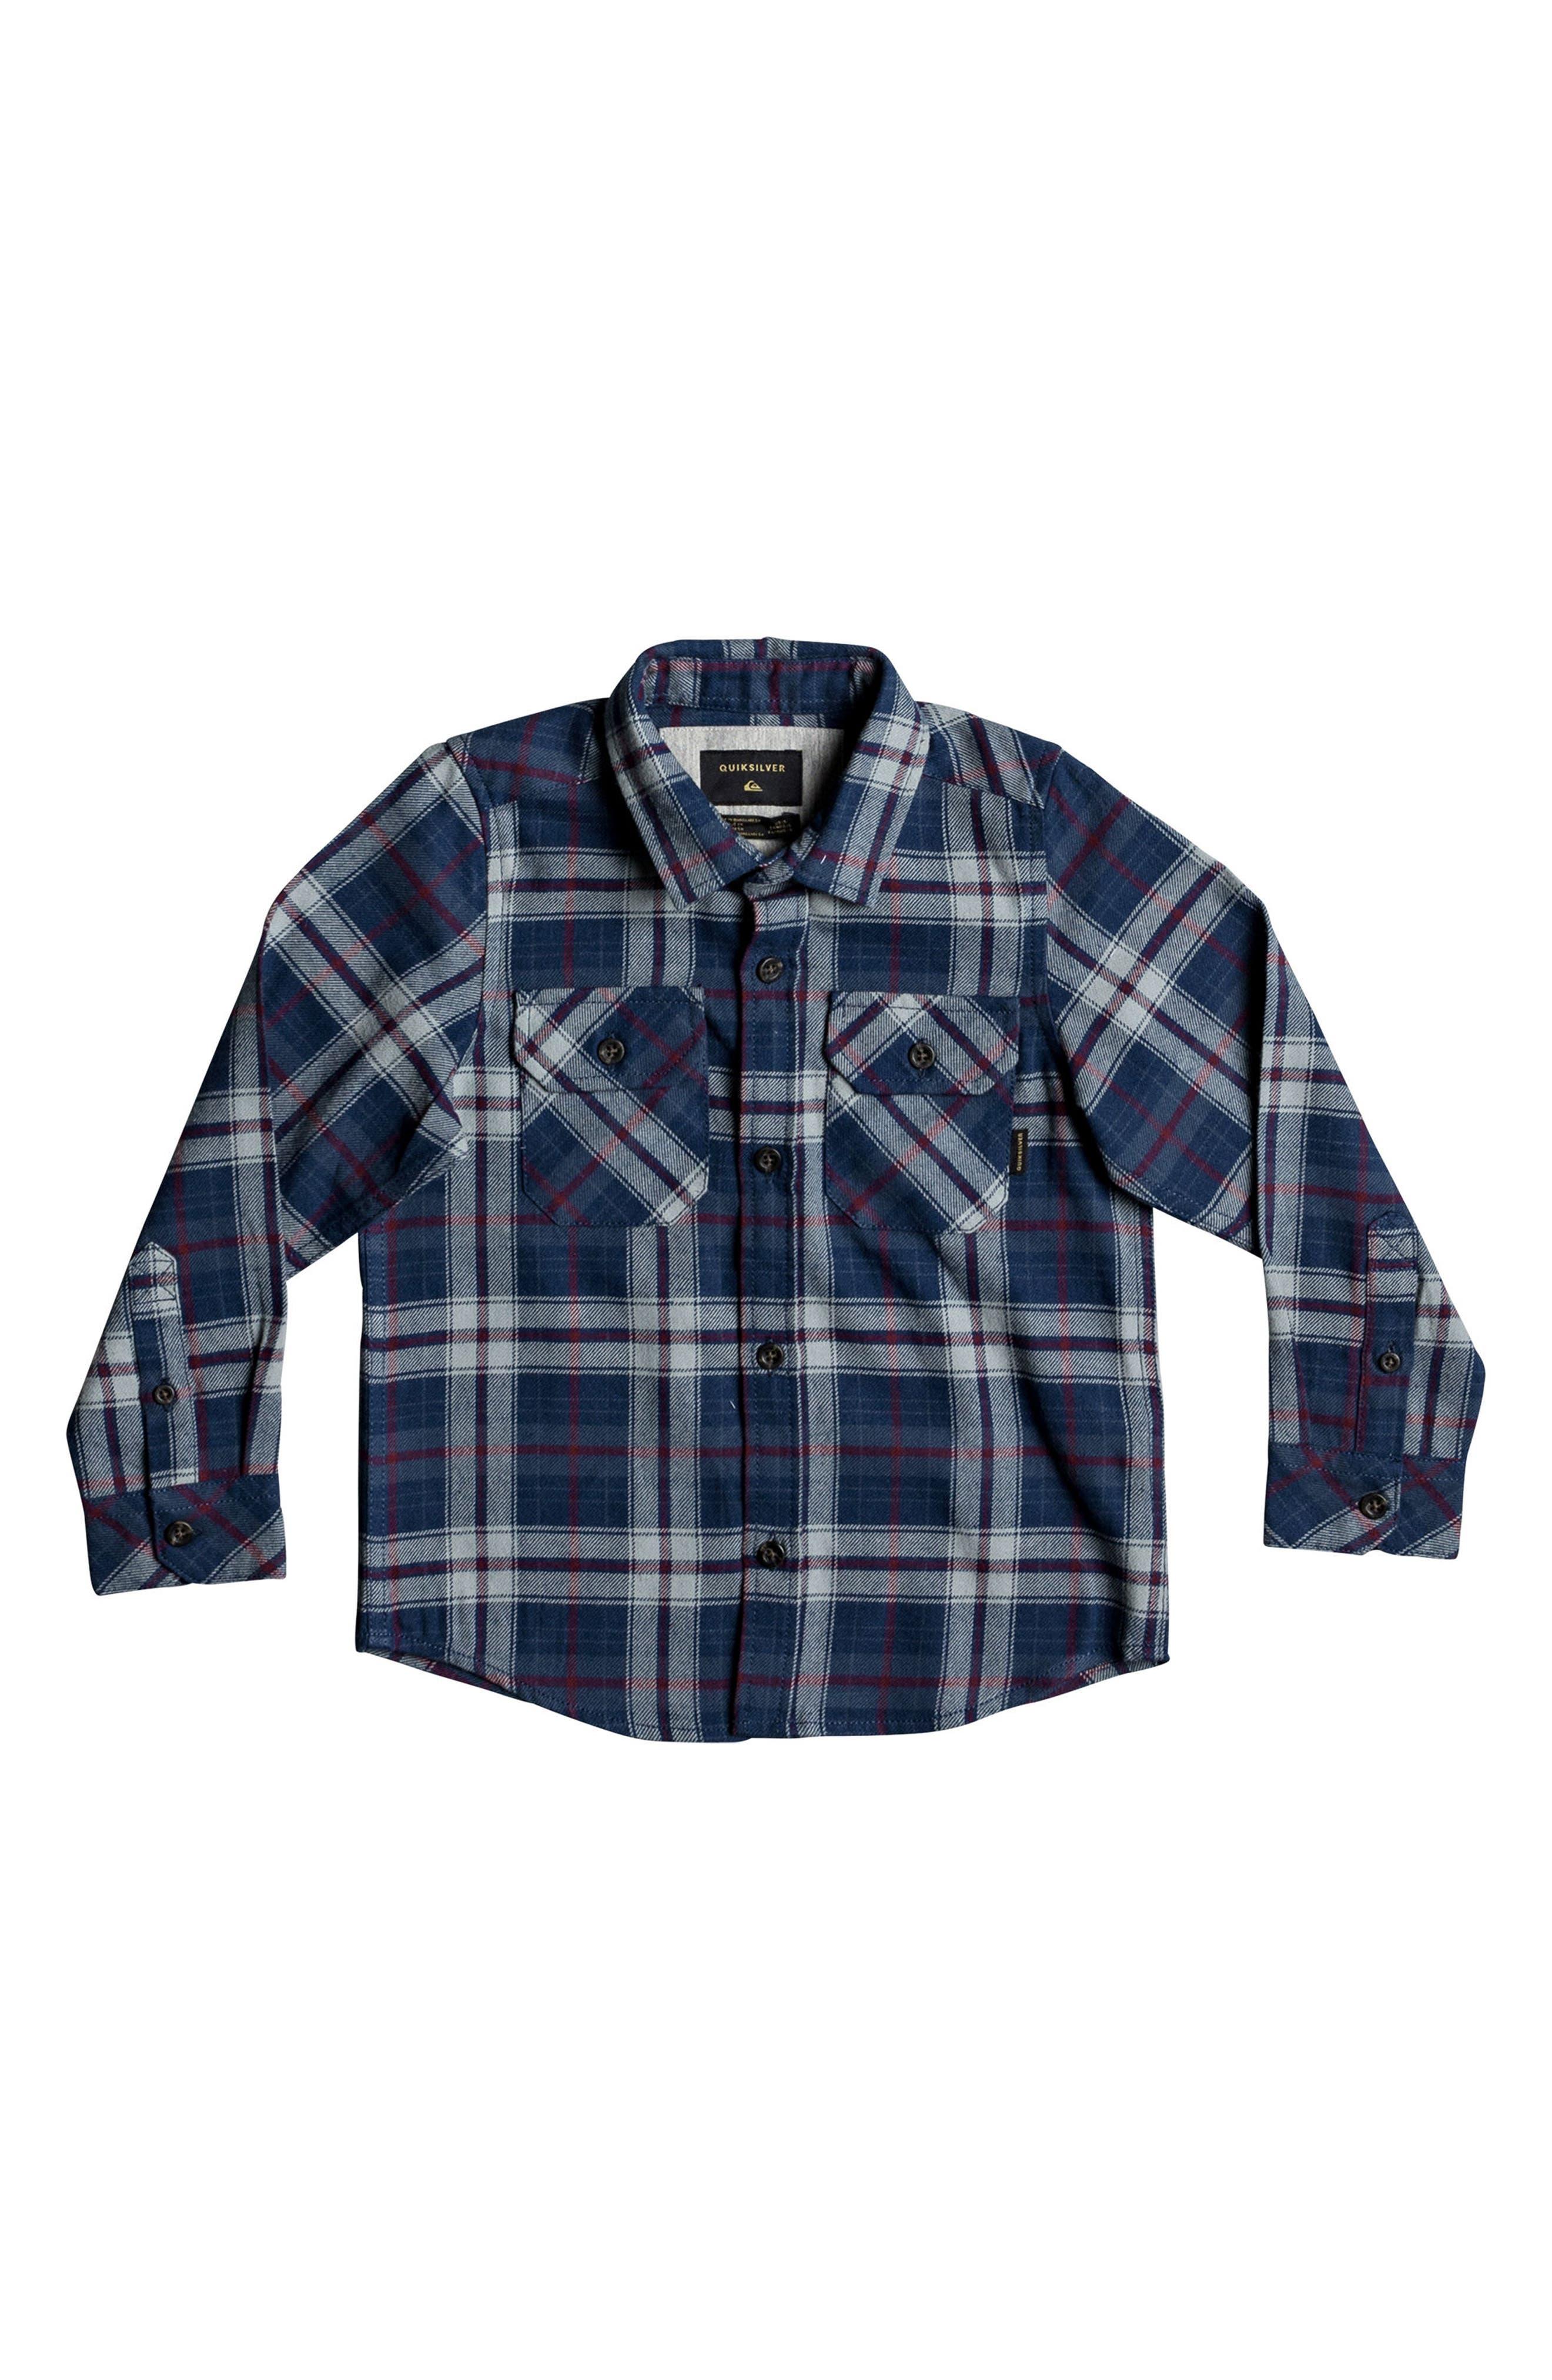 Alternate Image 1 Selected - Quiksilver Fitzspeere Plaid Flannel Shirt (Toddler Boys & Little Boys)